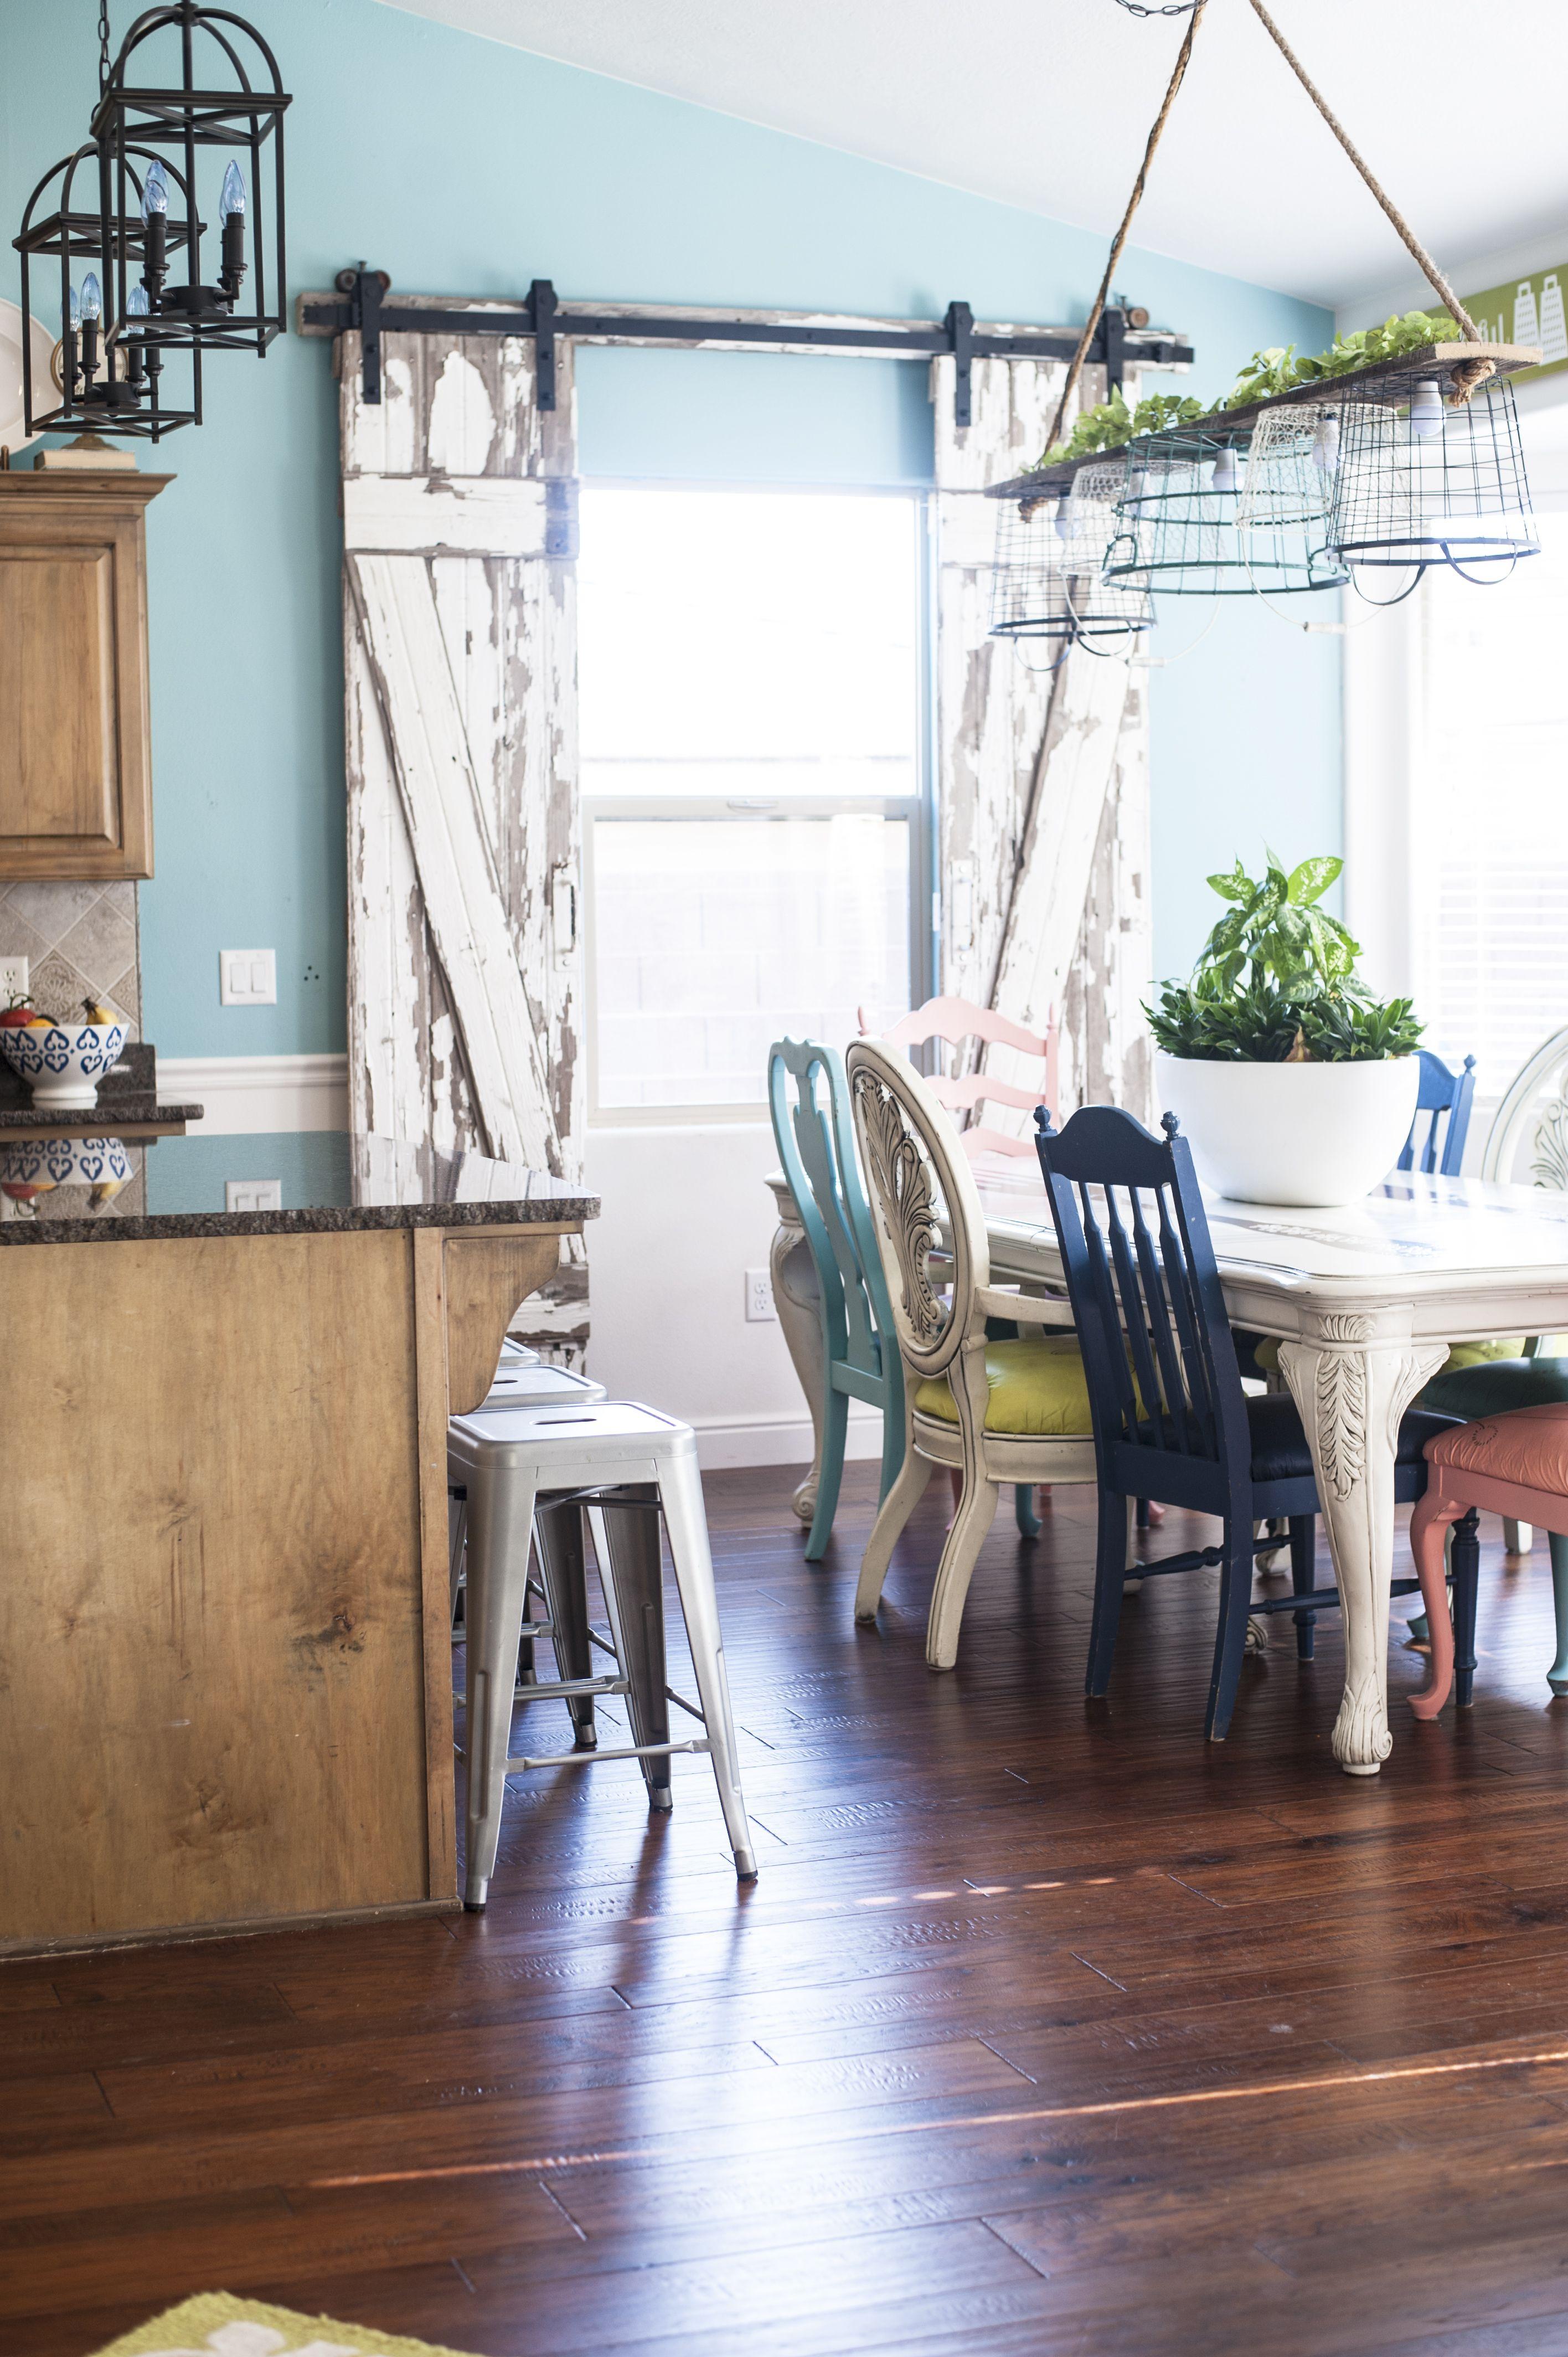 Diy interior sliding door - Diy Barn Door Instructions And Hardware Home Decor Ideas Pinterest Diy Barn Door Barn Doors And Hardware